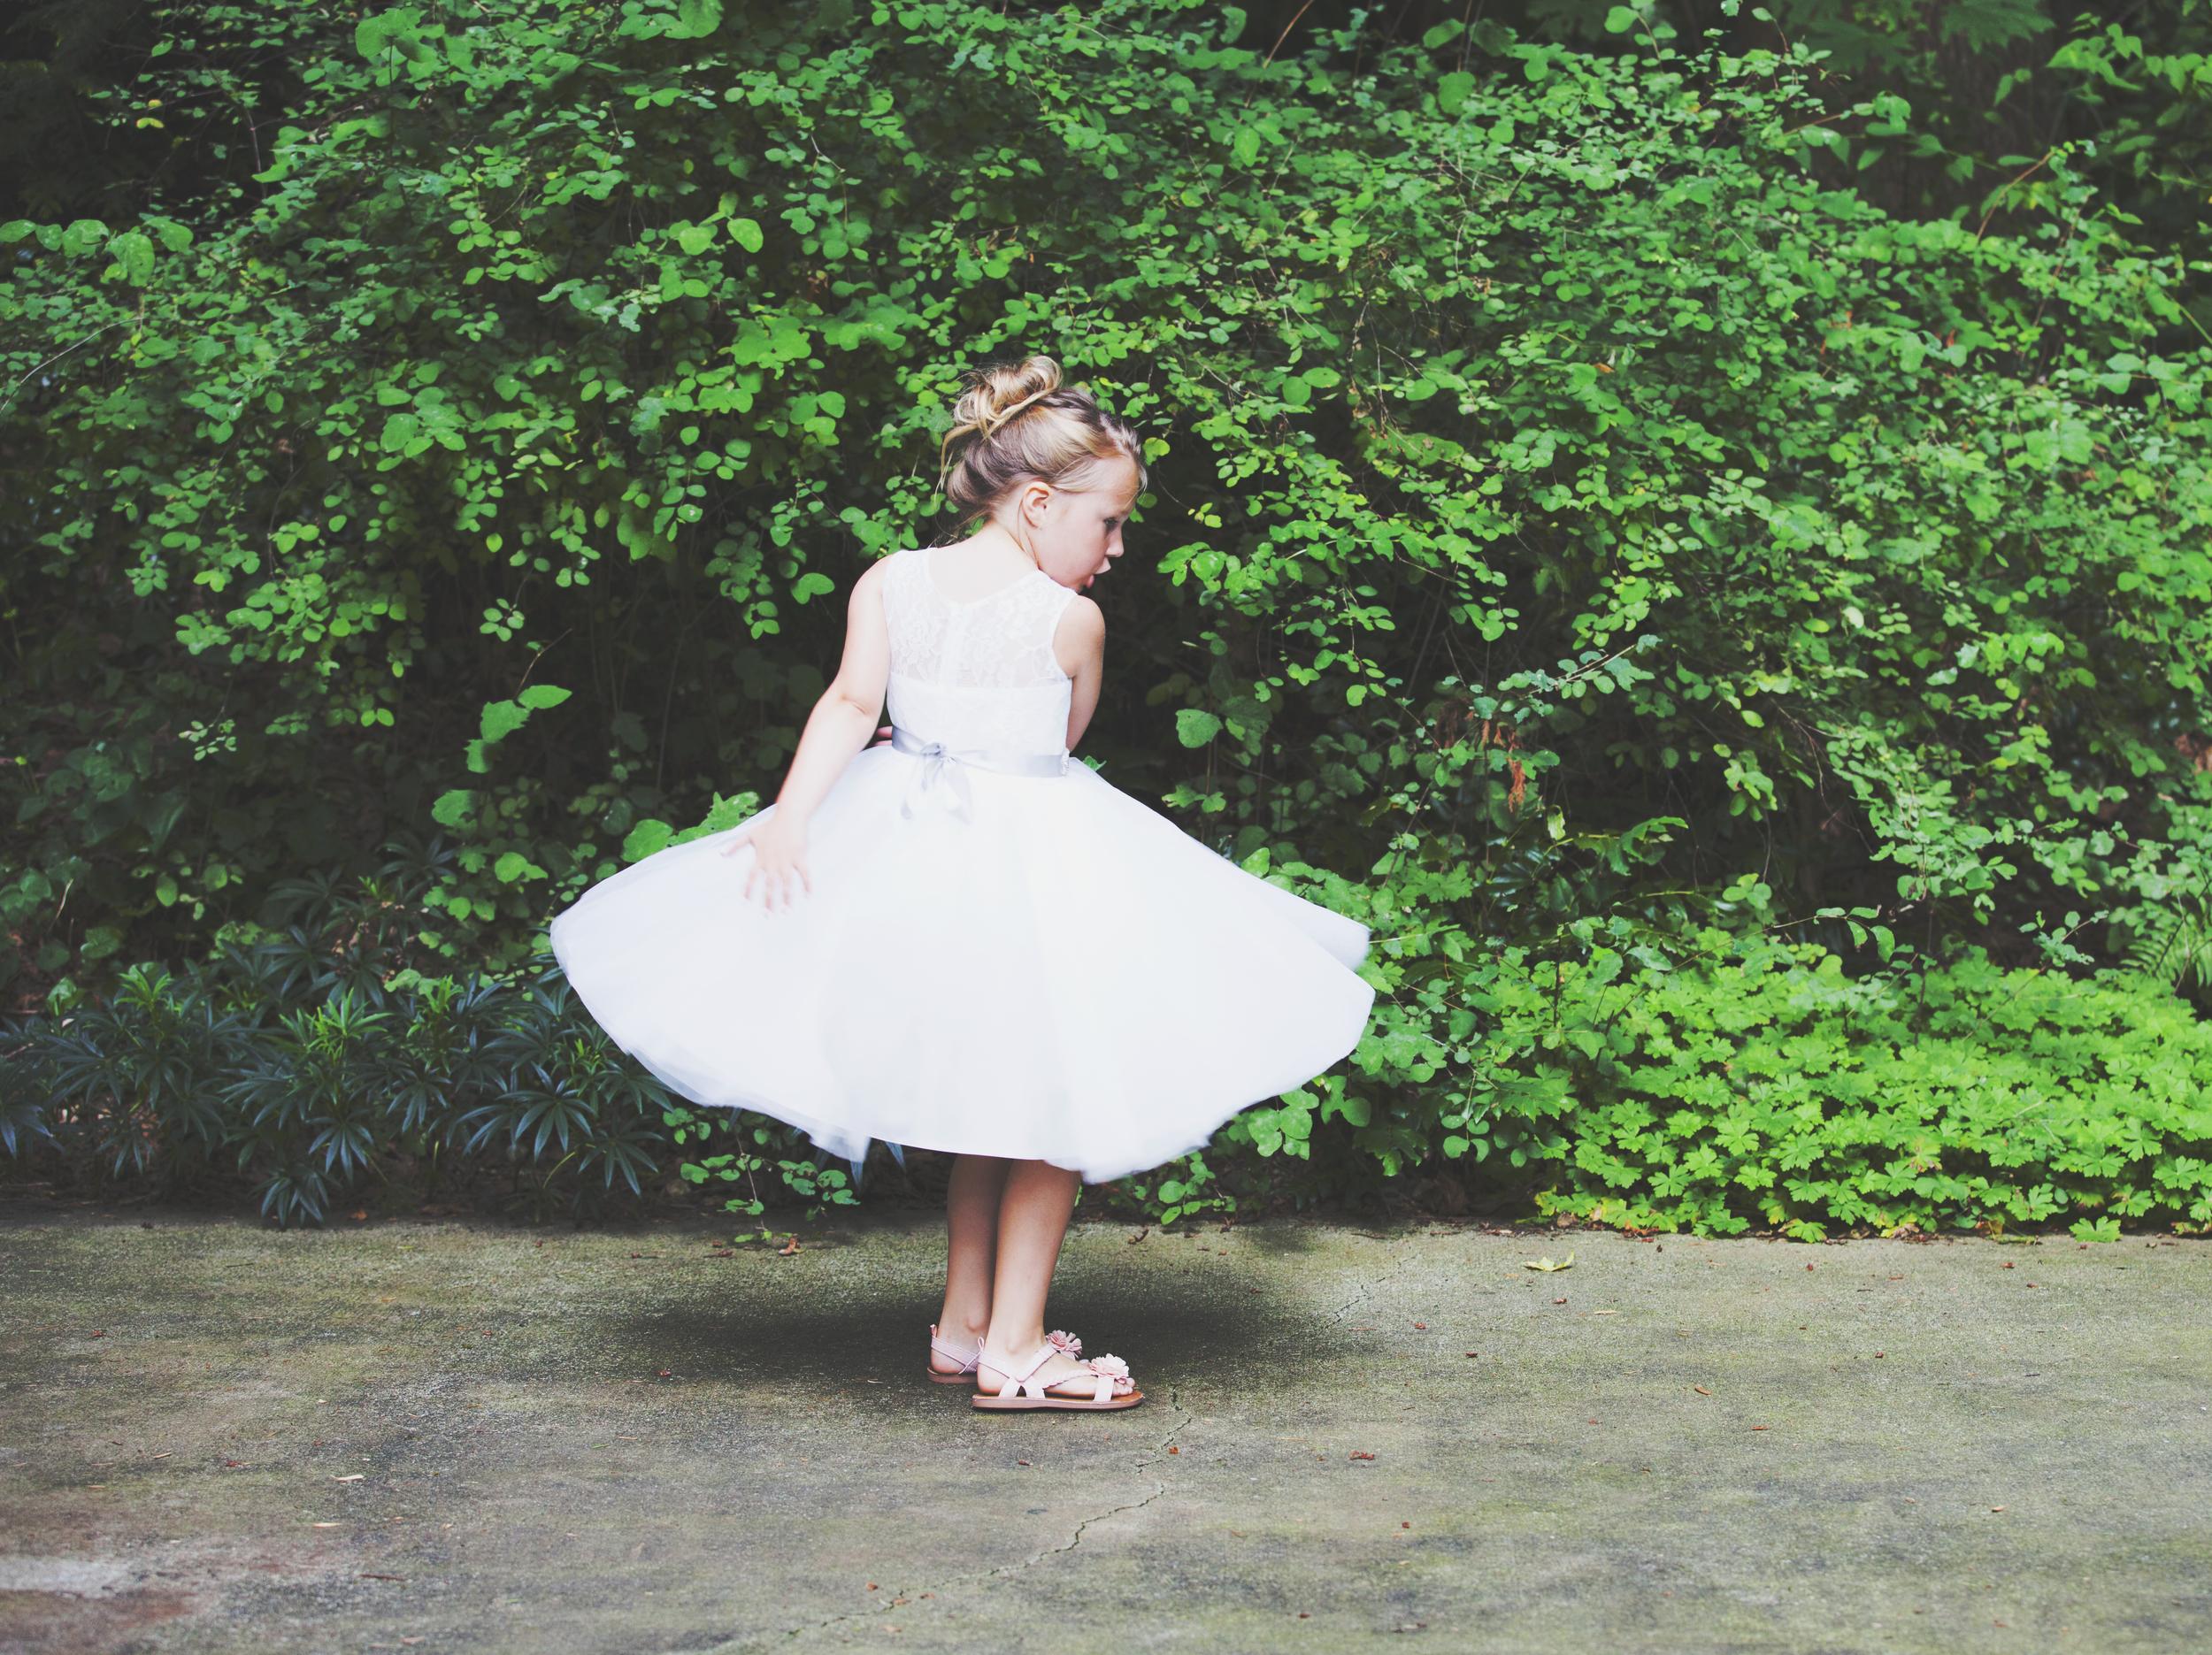 DancingIMG_3830.jpg